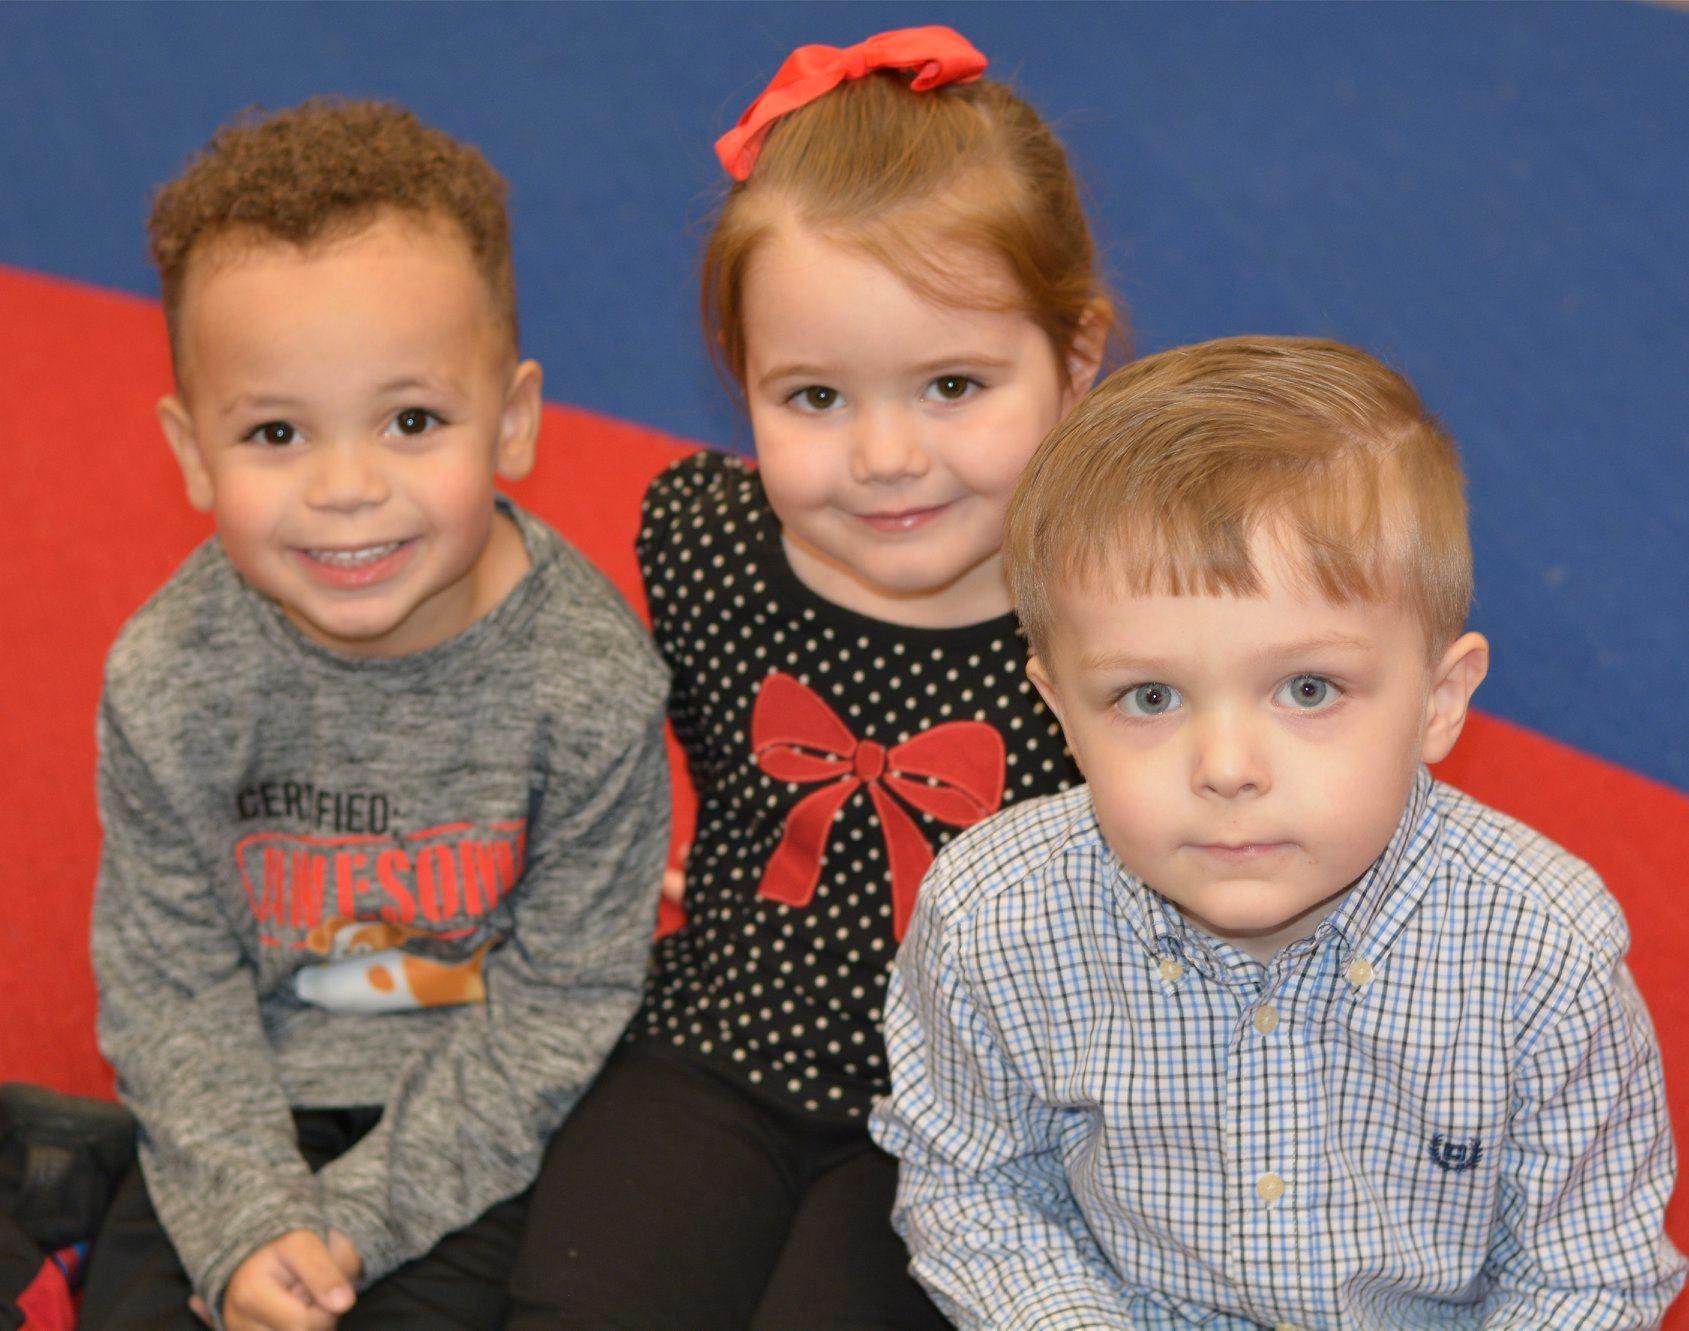 Preschool students at play